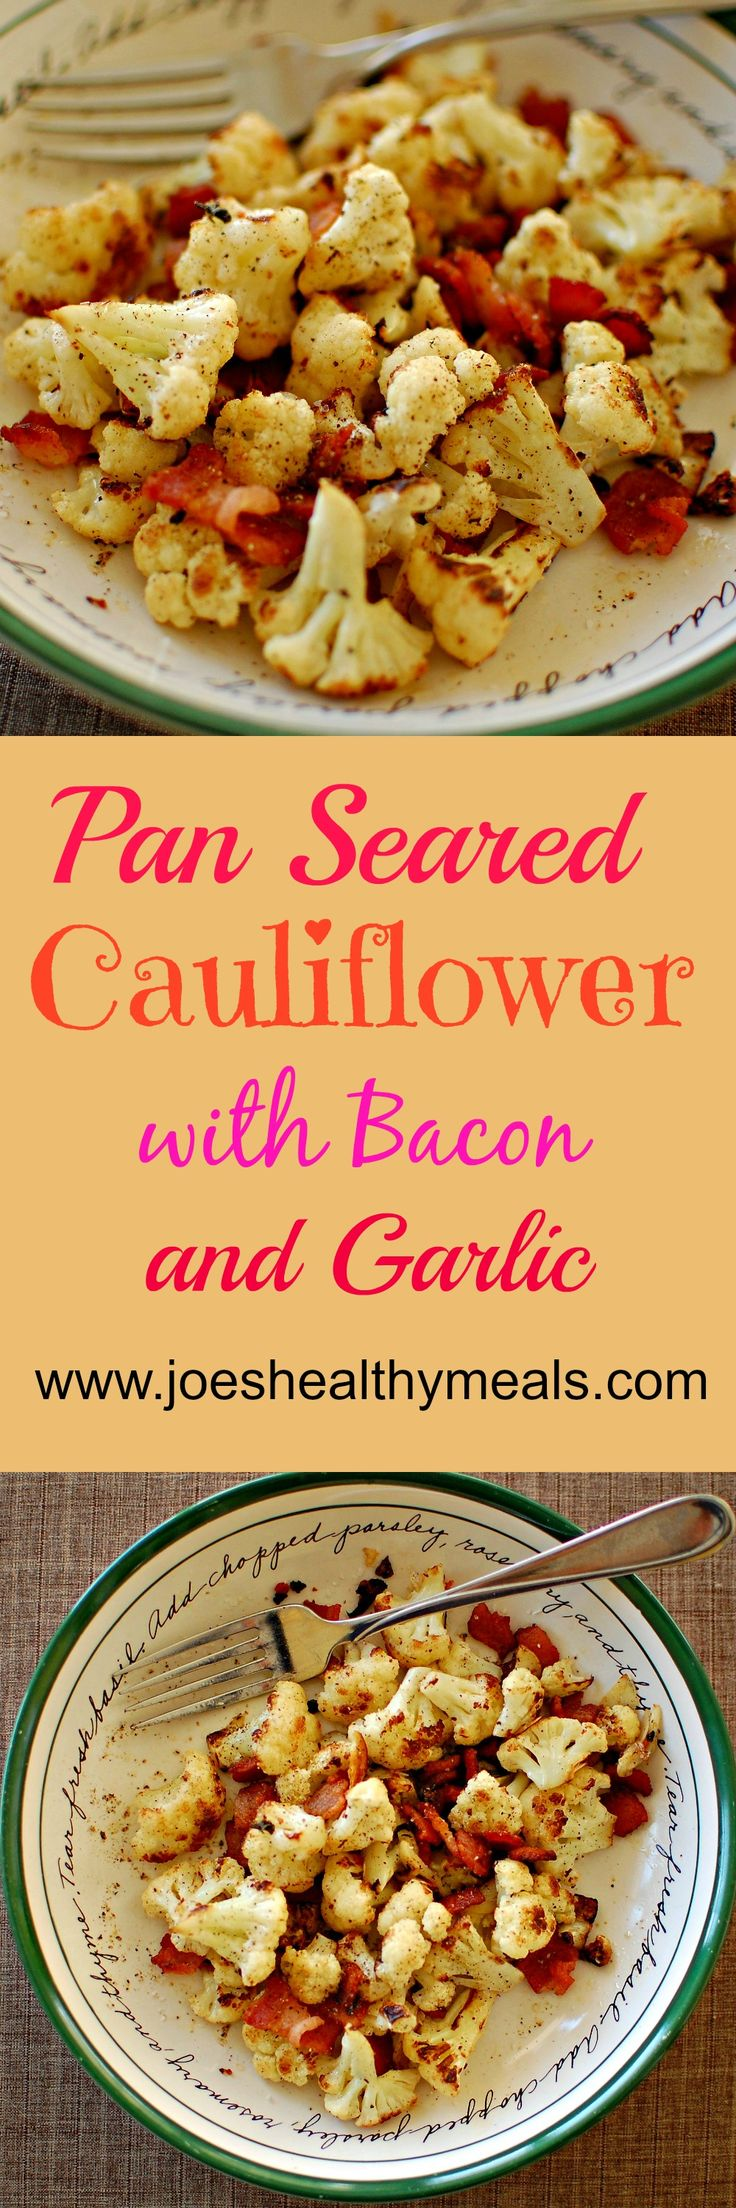 Pan Seared Cauliflower With Bacon And Garlic Recipe.